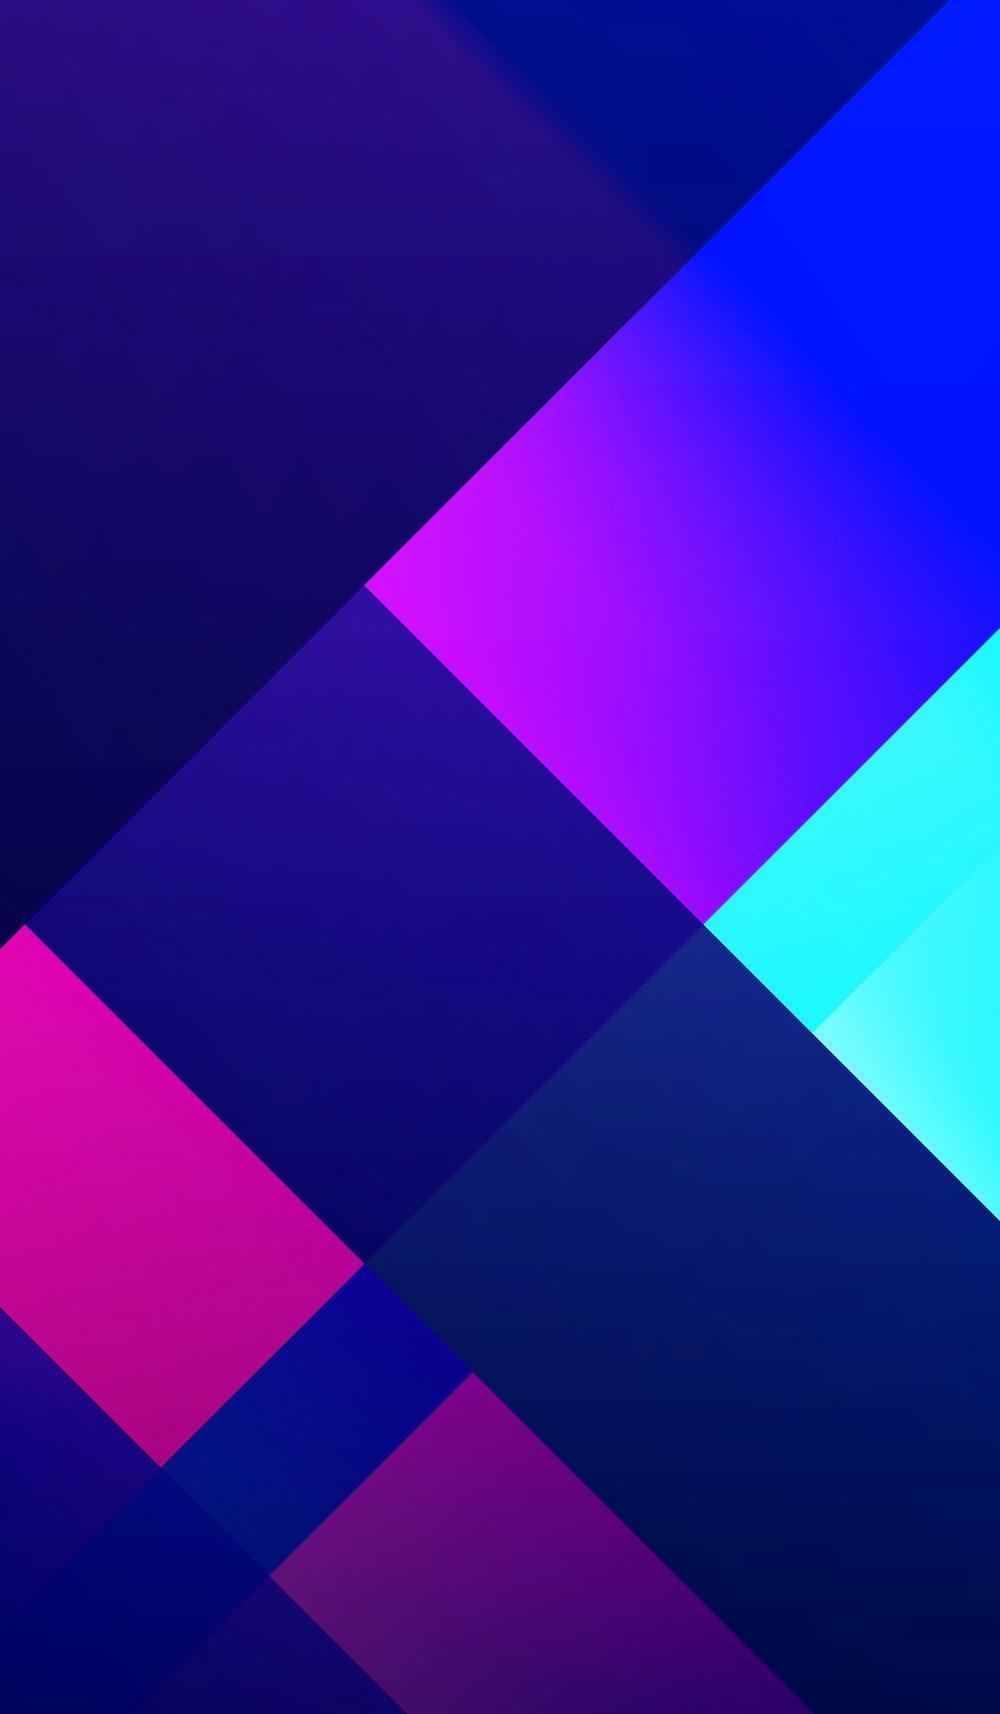 purple and black checkered illustration